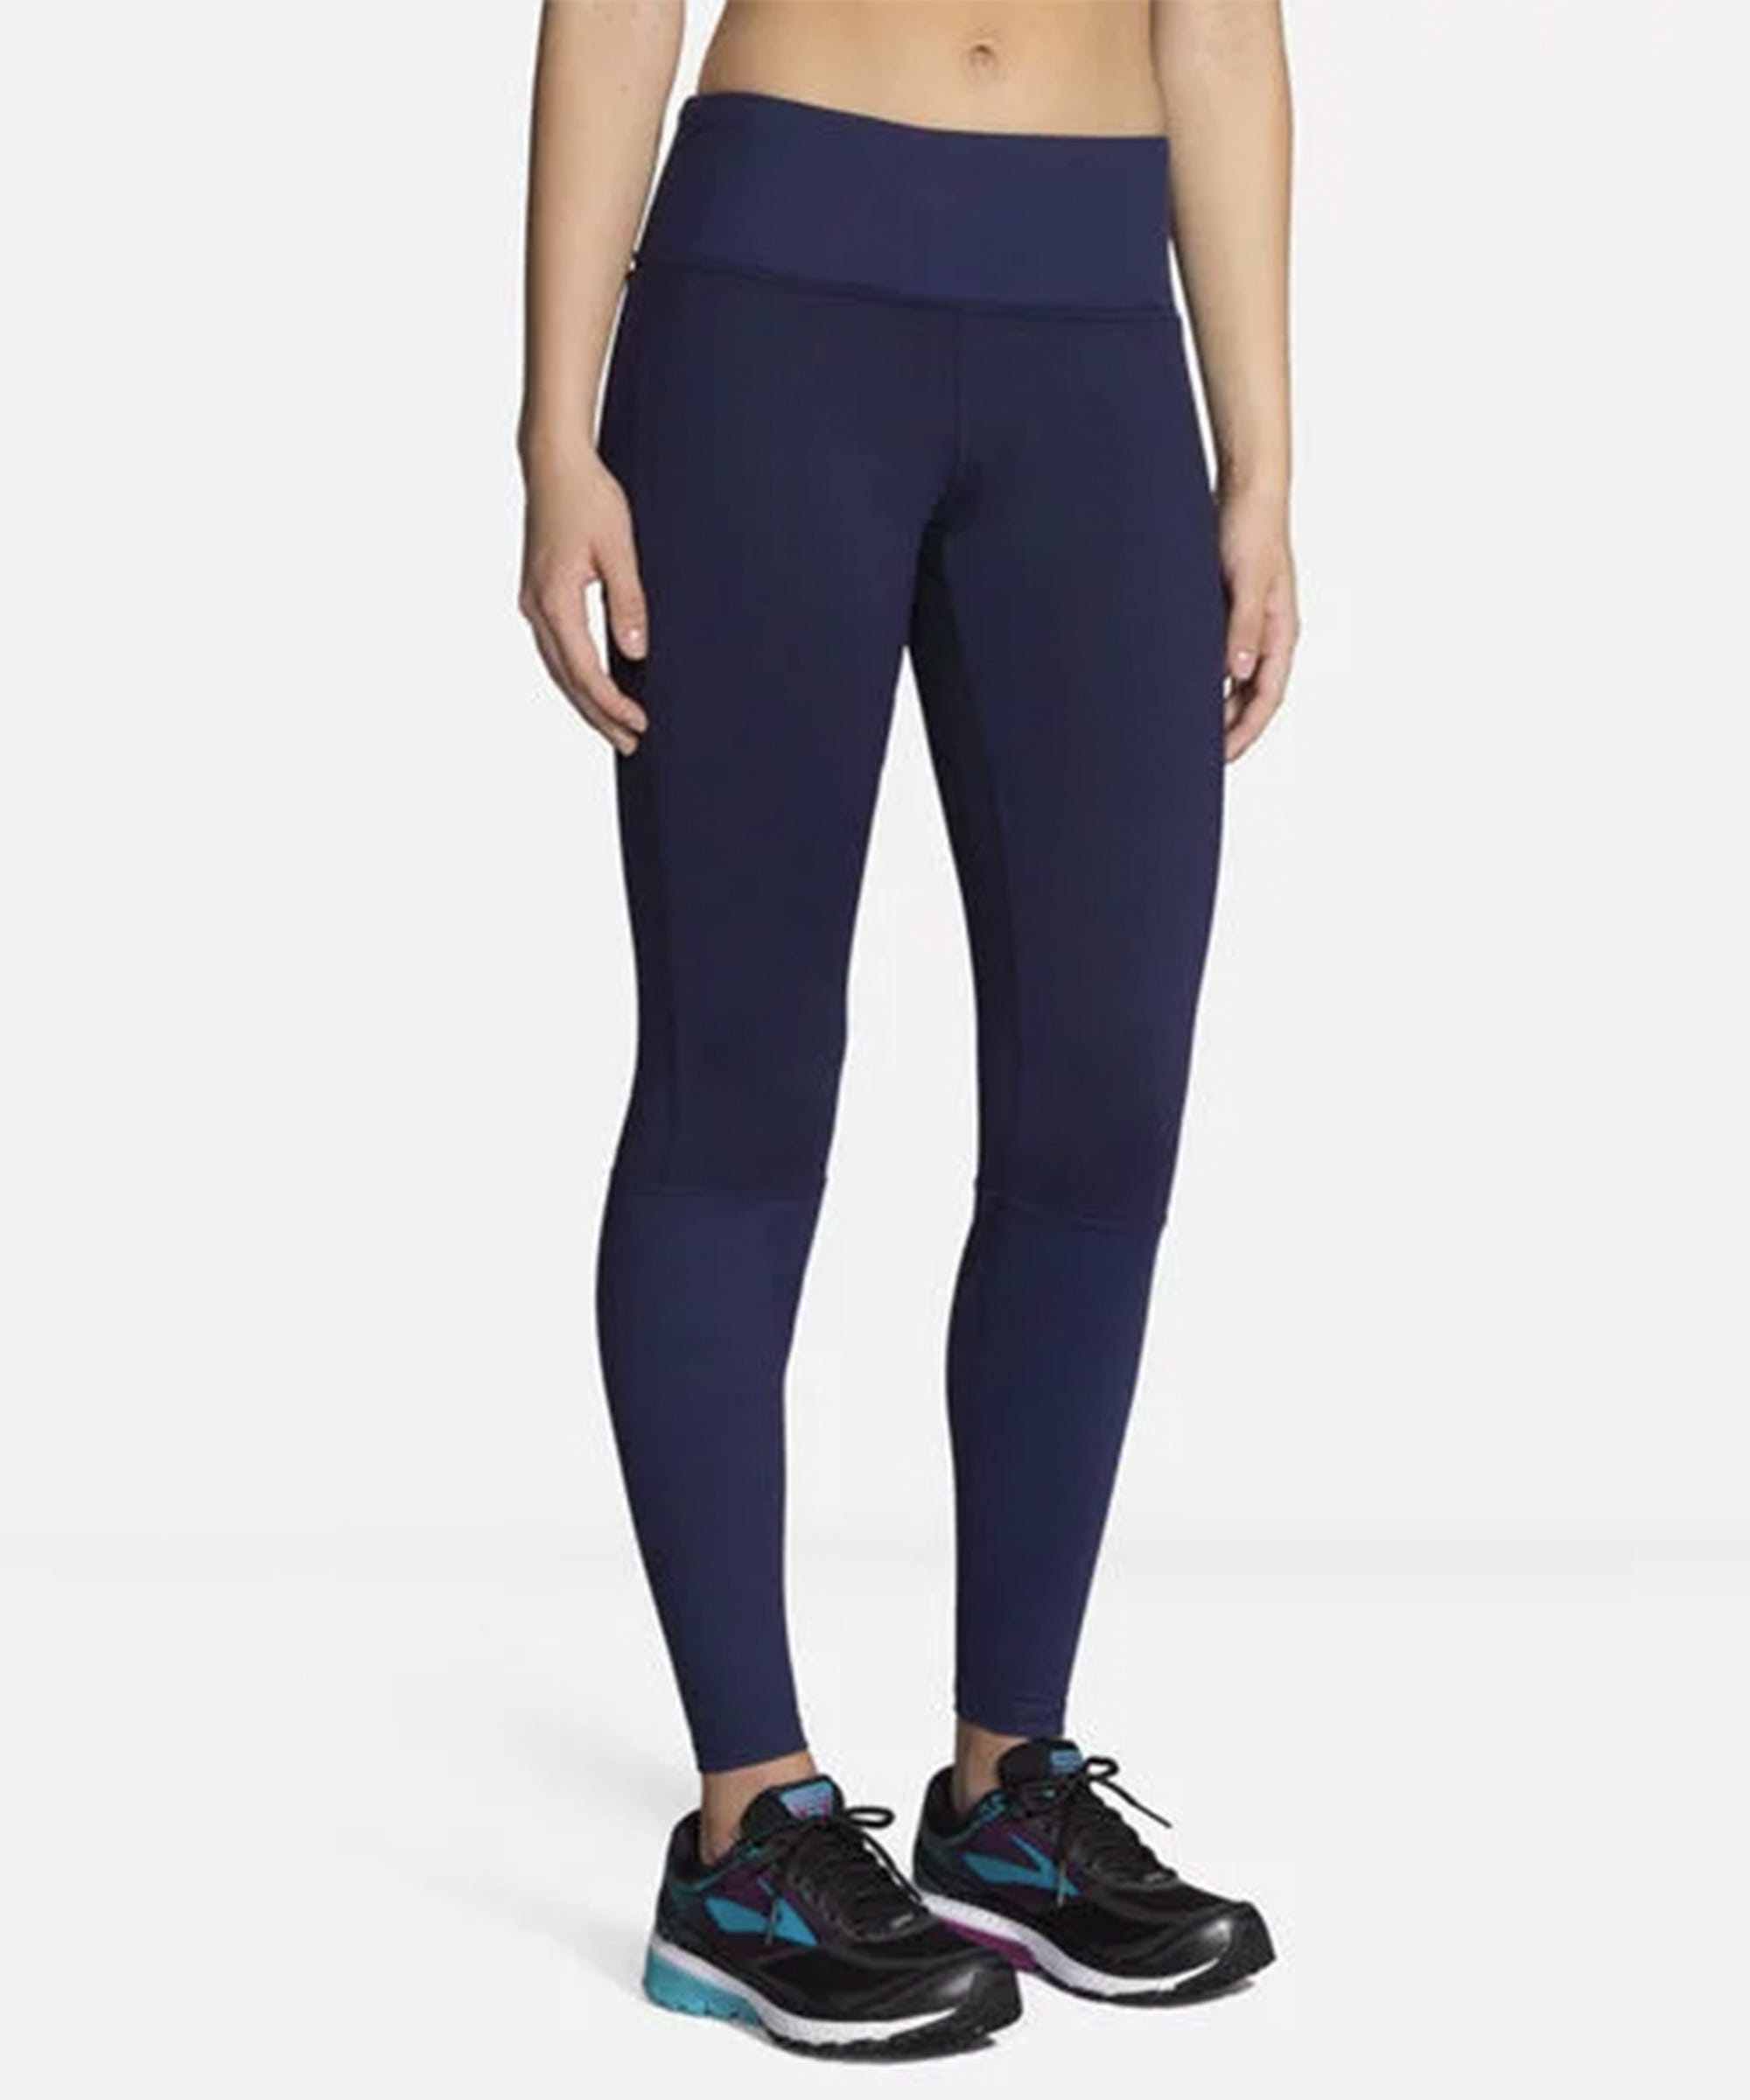 Best Warm Leggings For Winter Workouts Clothes 54e201d6c02